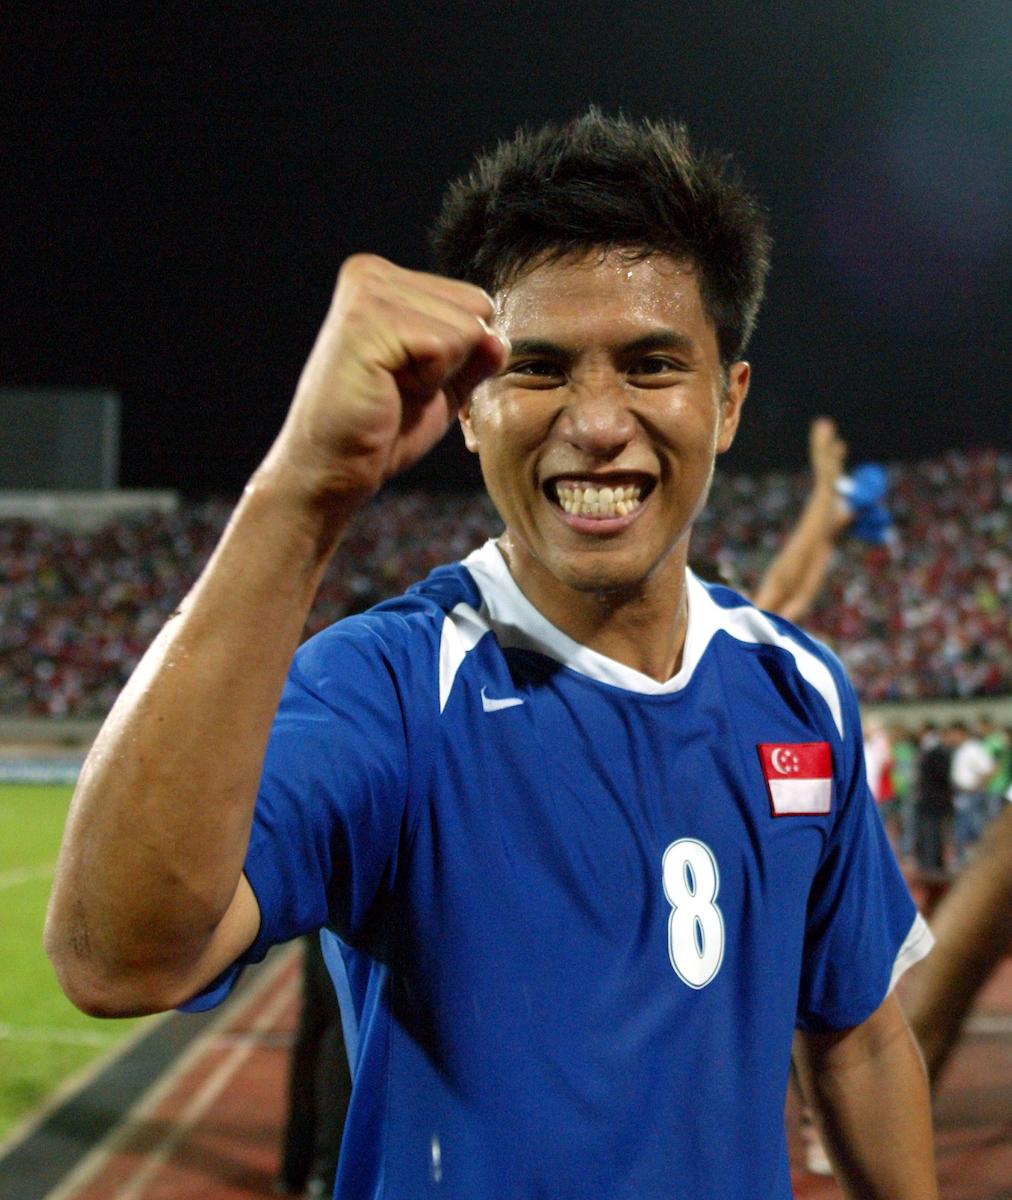 2️⃣ 🏆 1️⃣7️⃣ ⚽  Happy birthday to #AFFChampionship's very own all-time top scorer, Noh Alam Shah! 🎉  #AFFSuzukiCup https://t.co/kEQpTpfAxH